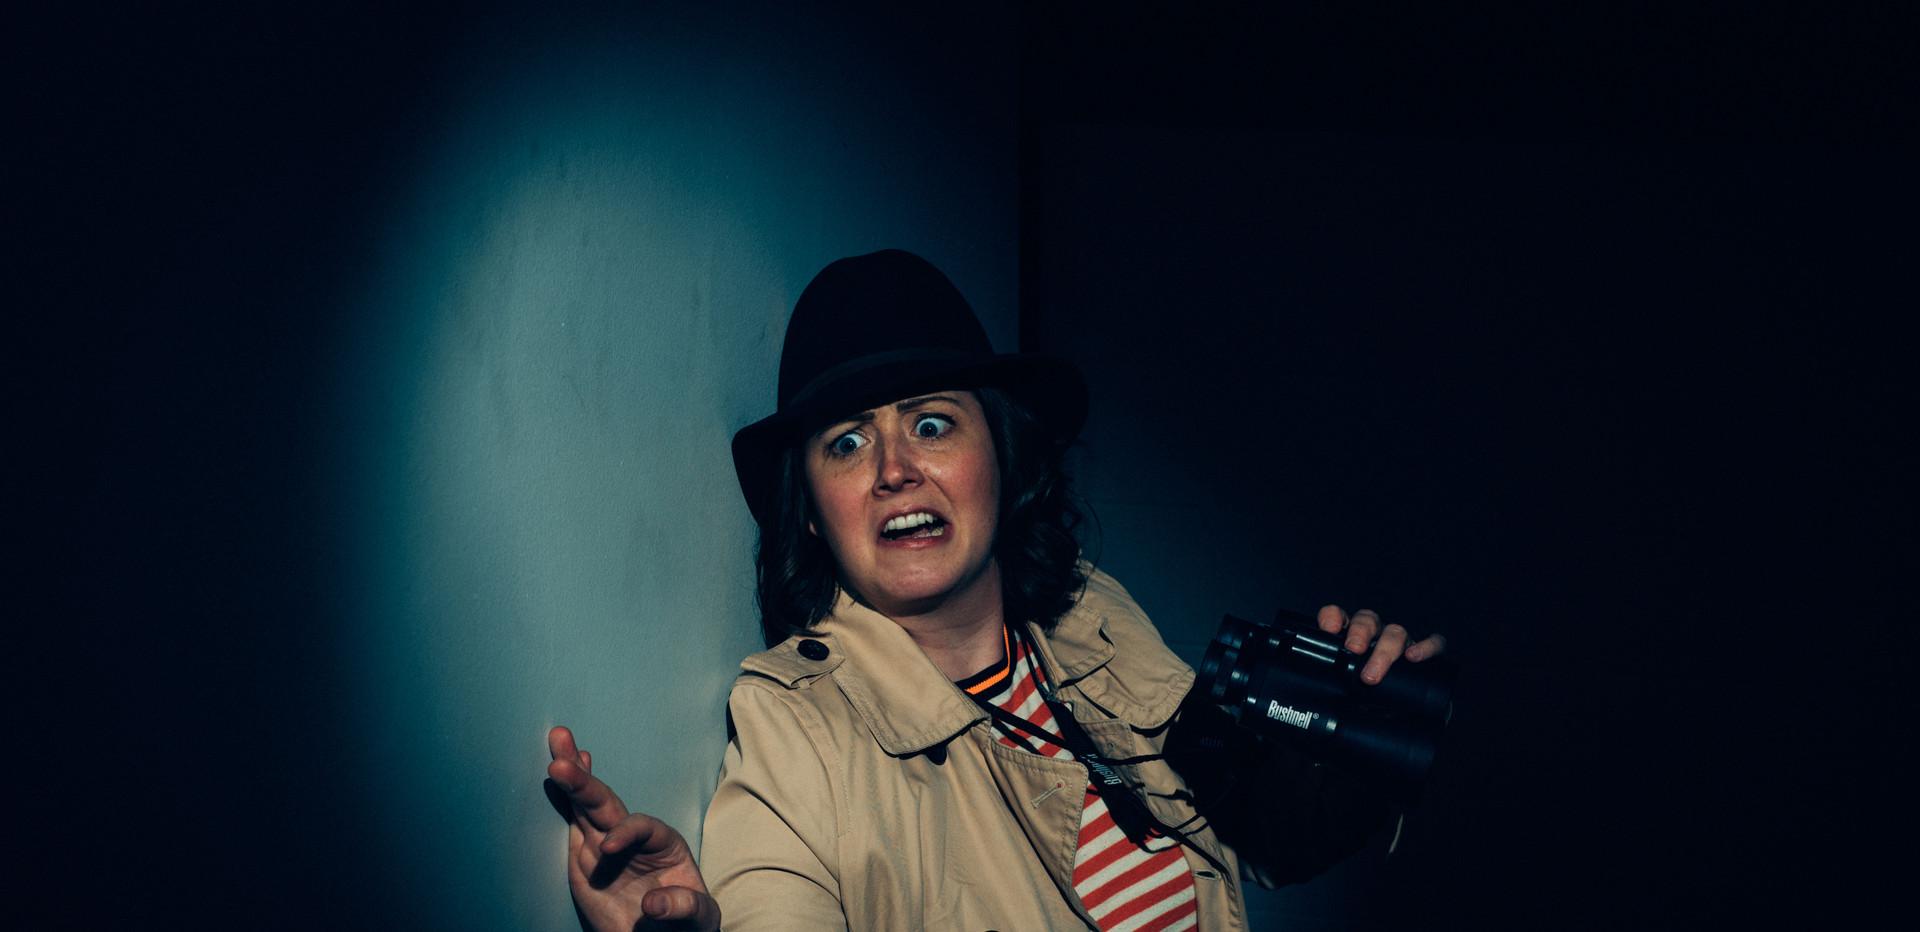 Alyson Dicey as Swanson